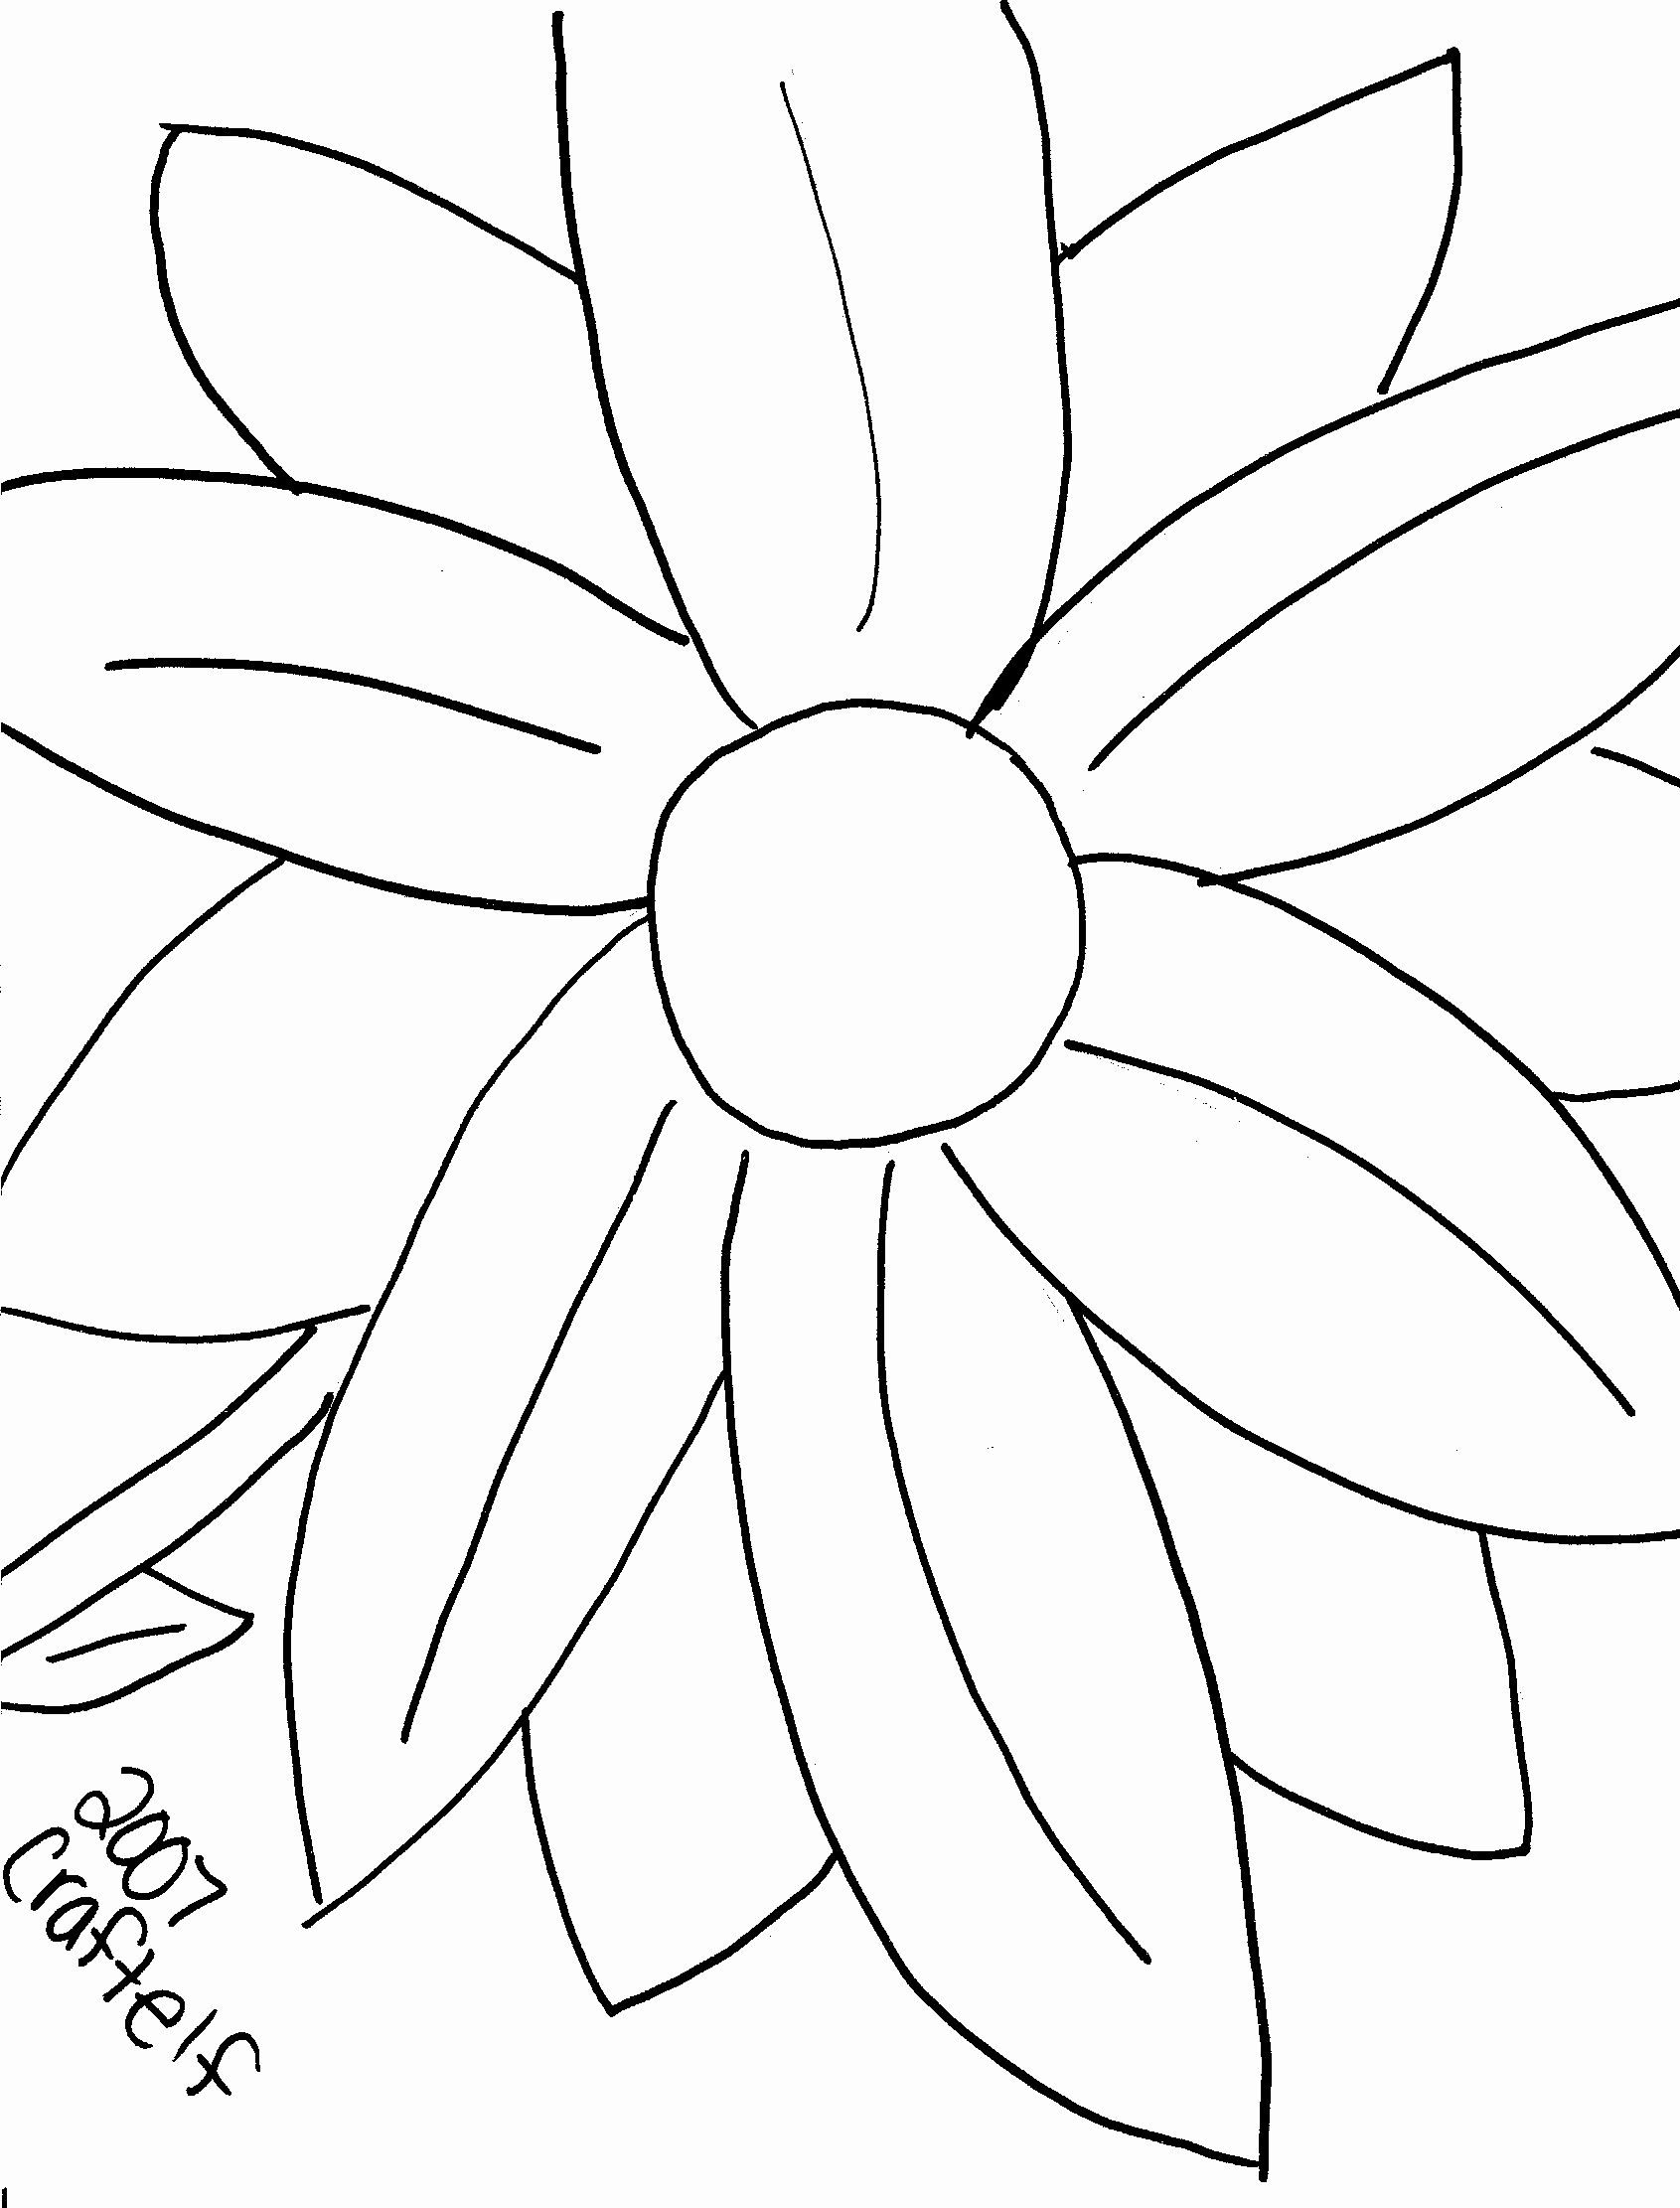 Big Flower Coloring Pages Duathlongijon Coloring Blog Flower Coloring Sheets Flower Coloring Pages Coloring Pages [ 2222 x 1691 Pixel ]